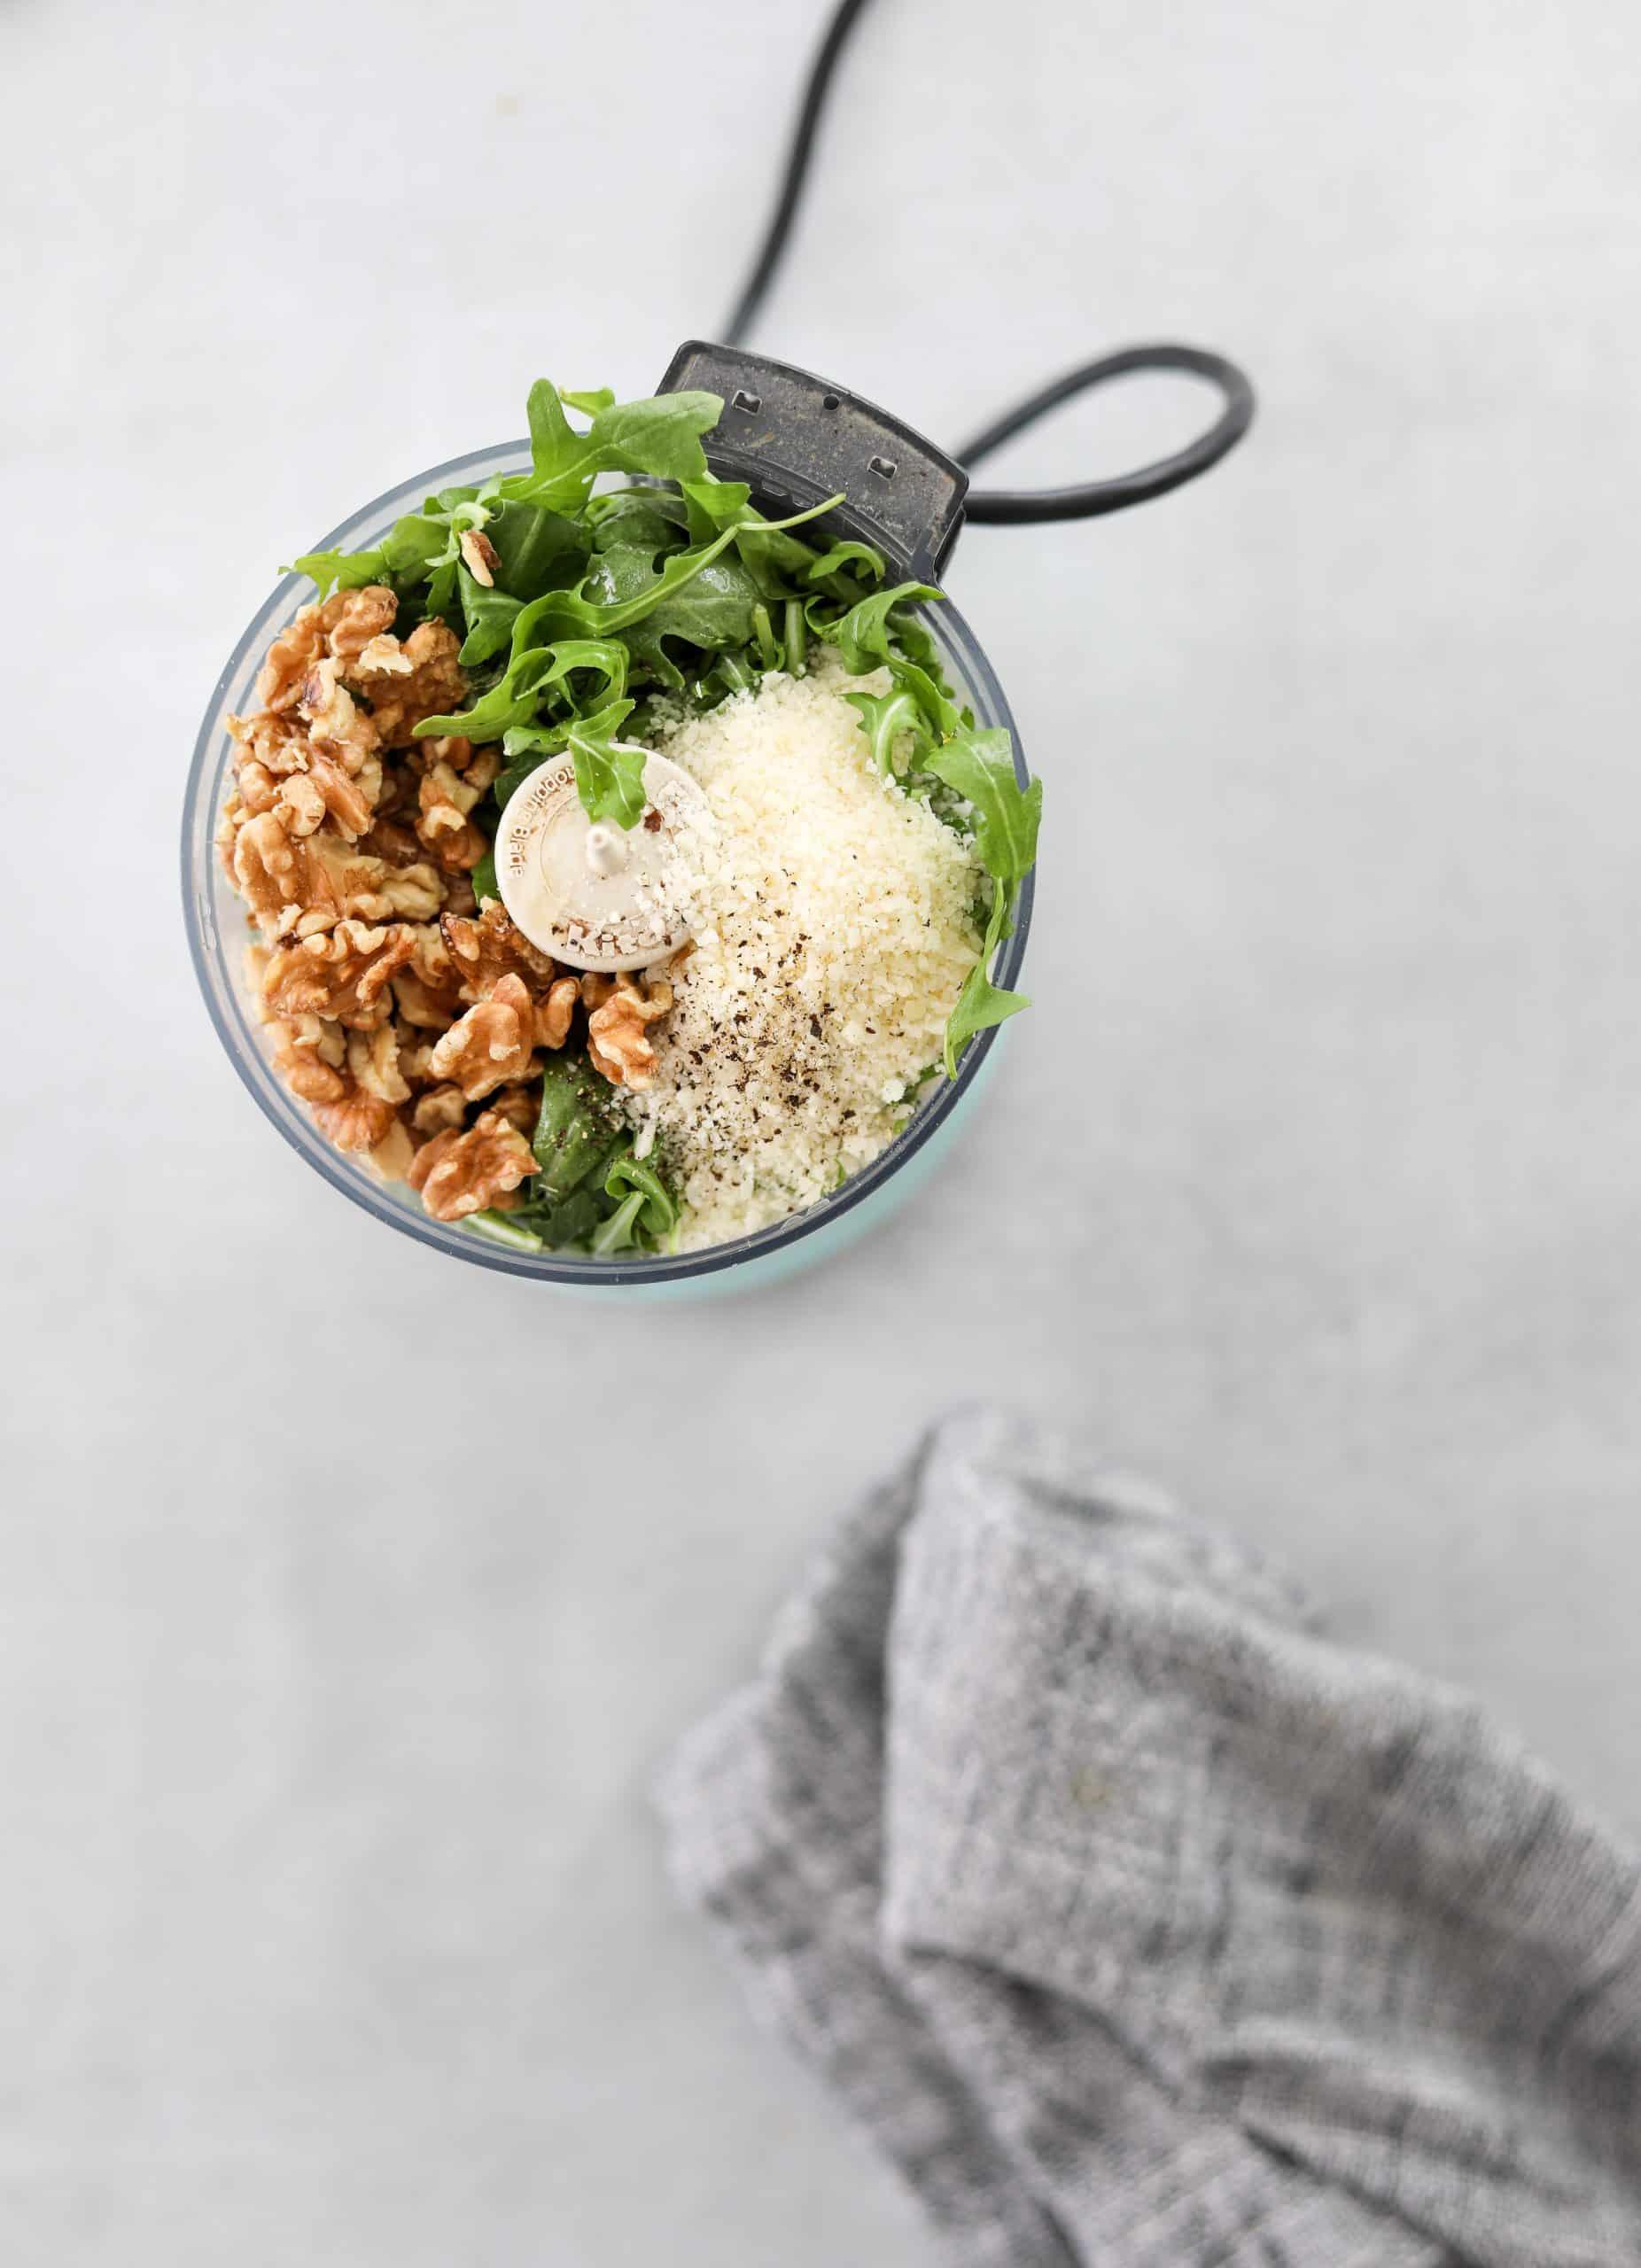 Arugula pesto ingredients in a food processor.